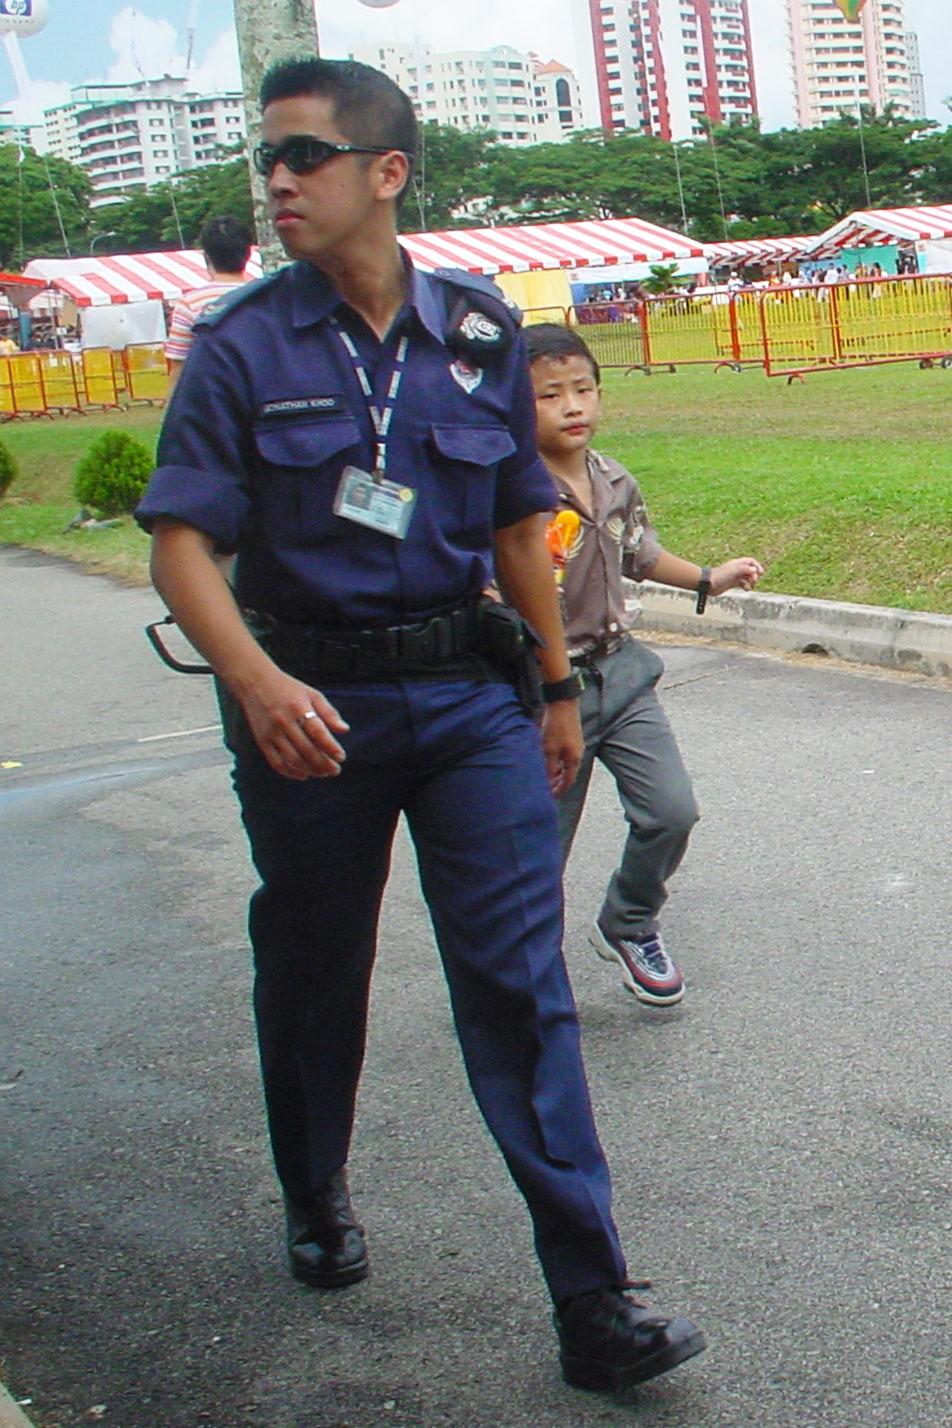 coast guard officer uniform